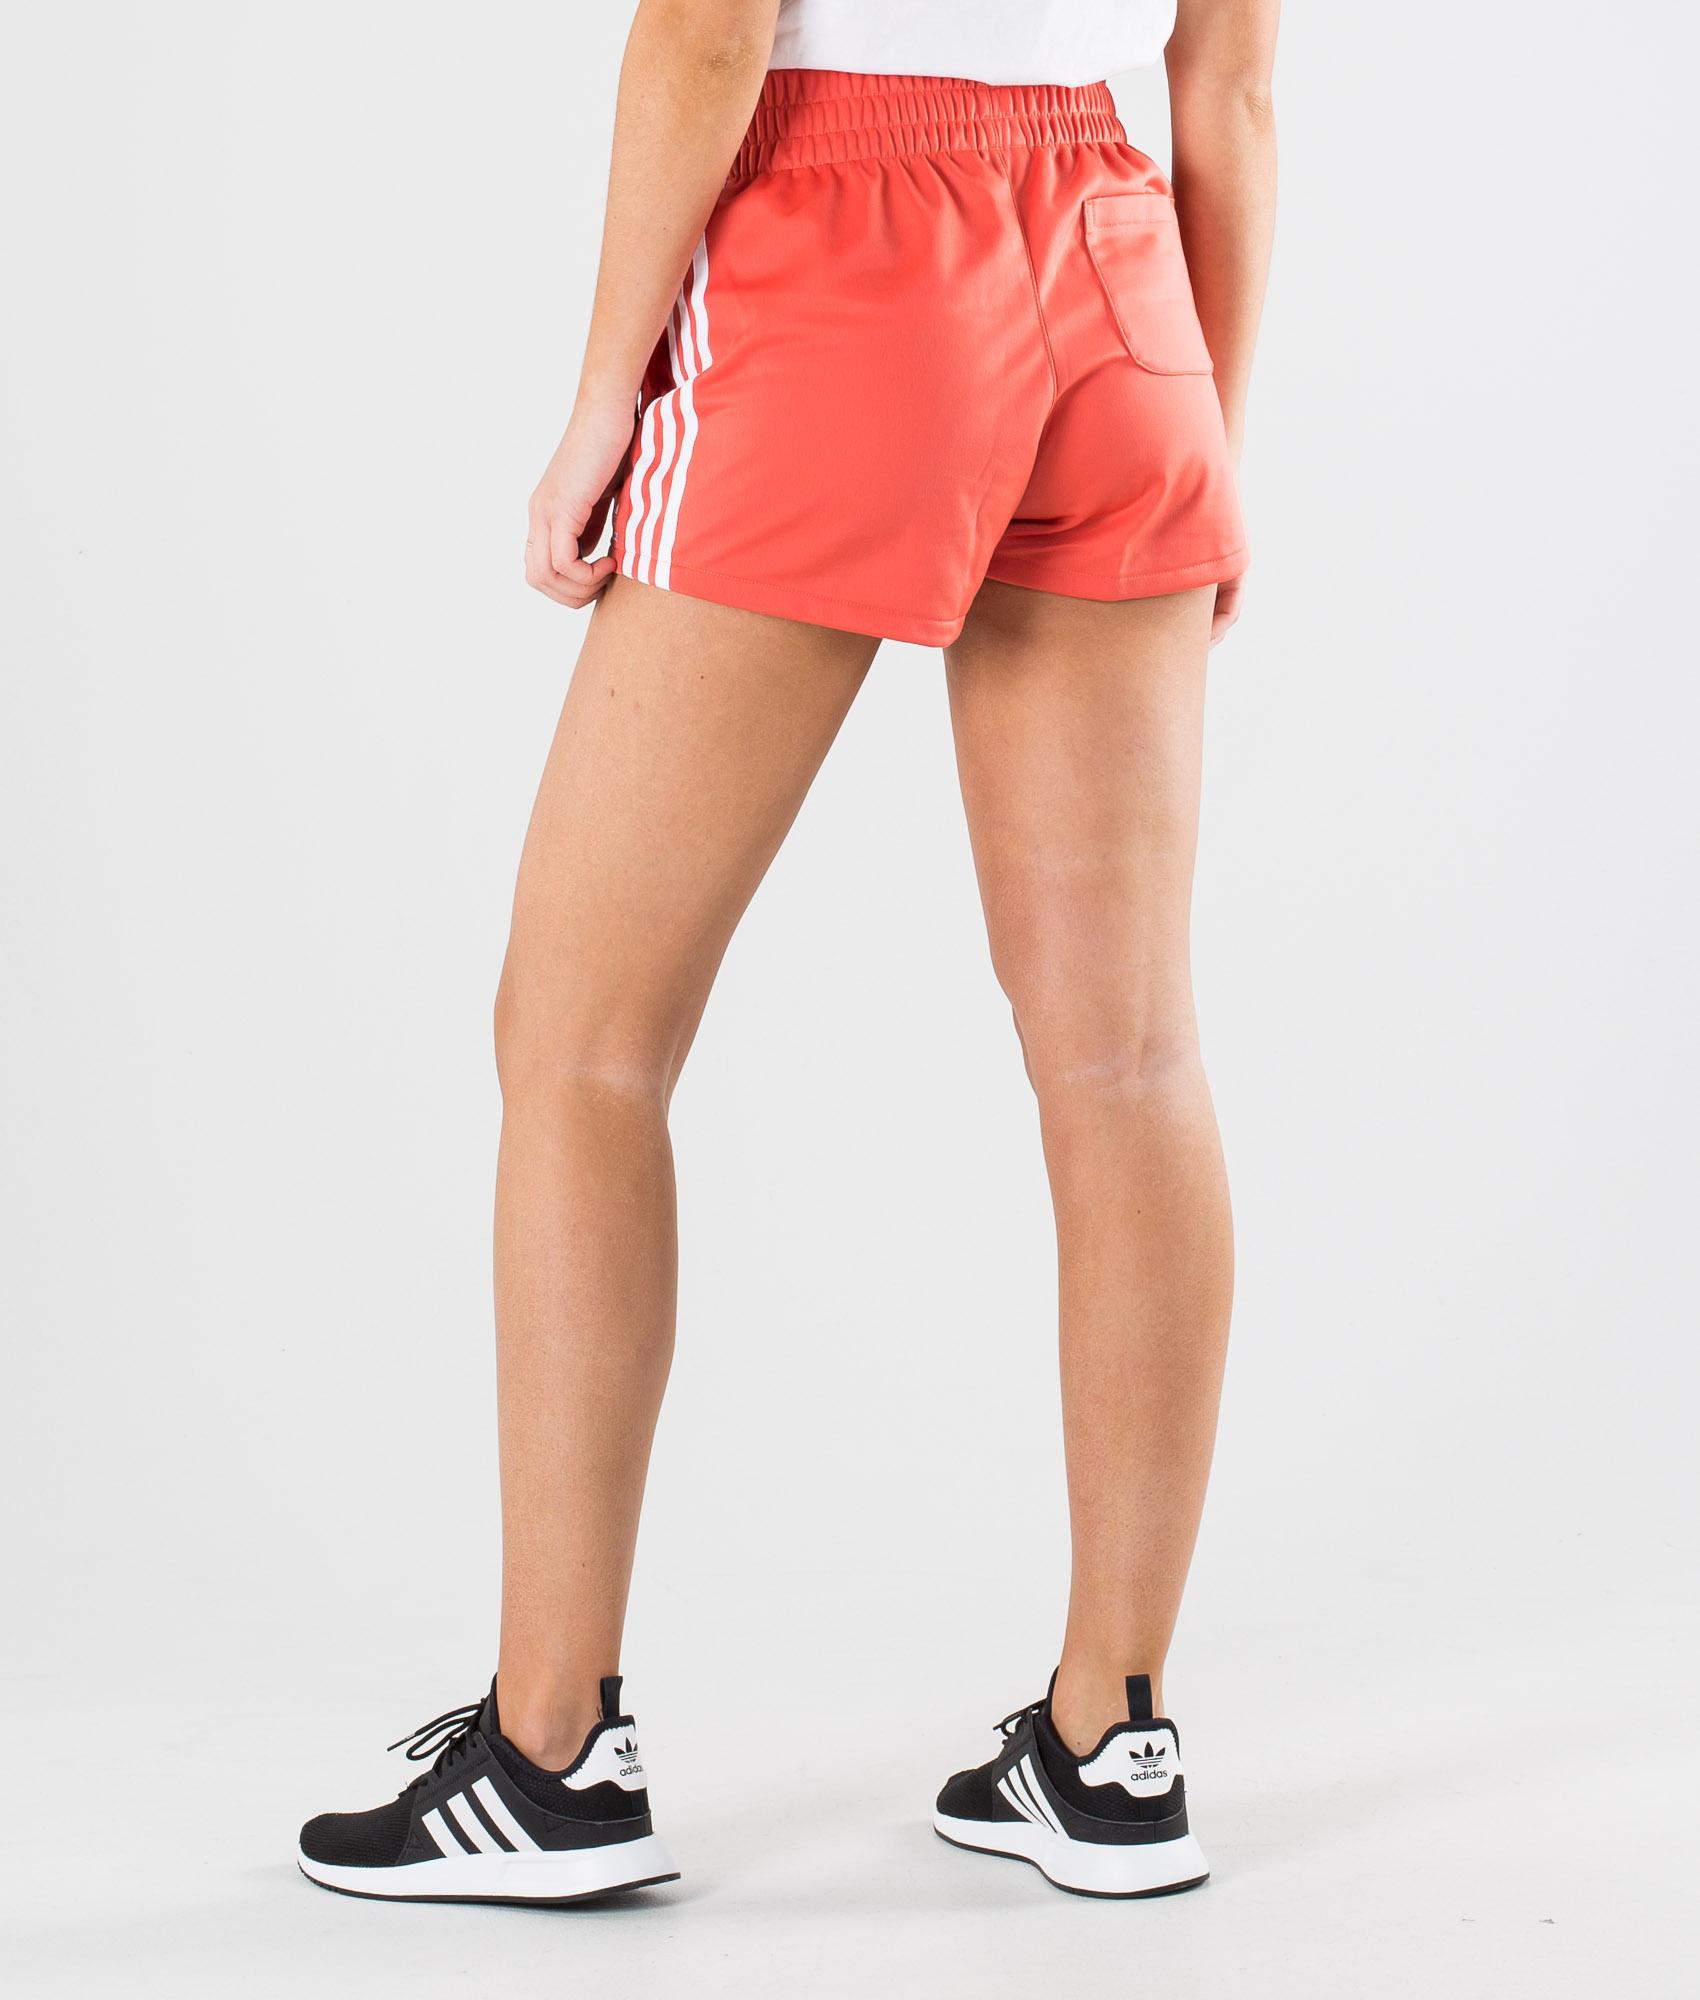 Adidas Originals 3 Stripe Short Shorts Trace Scarlet /White